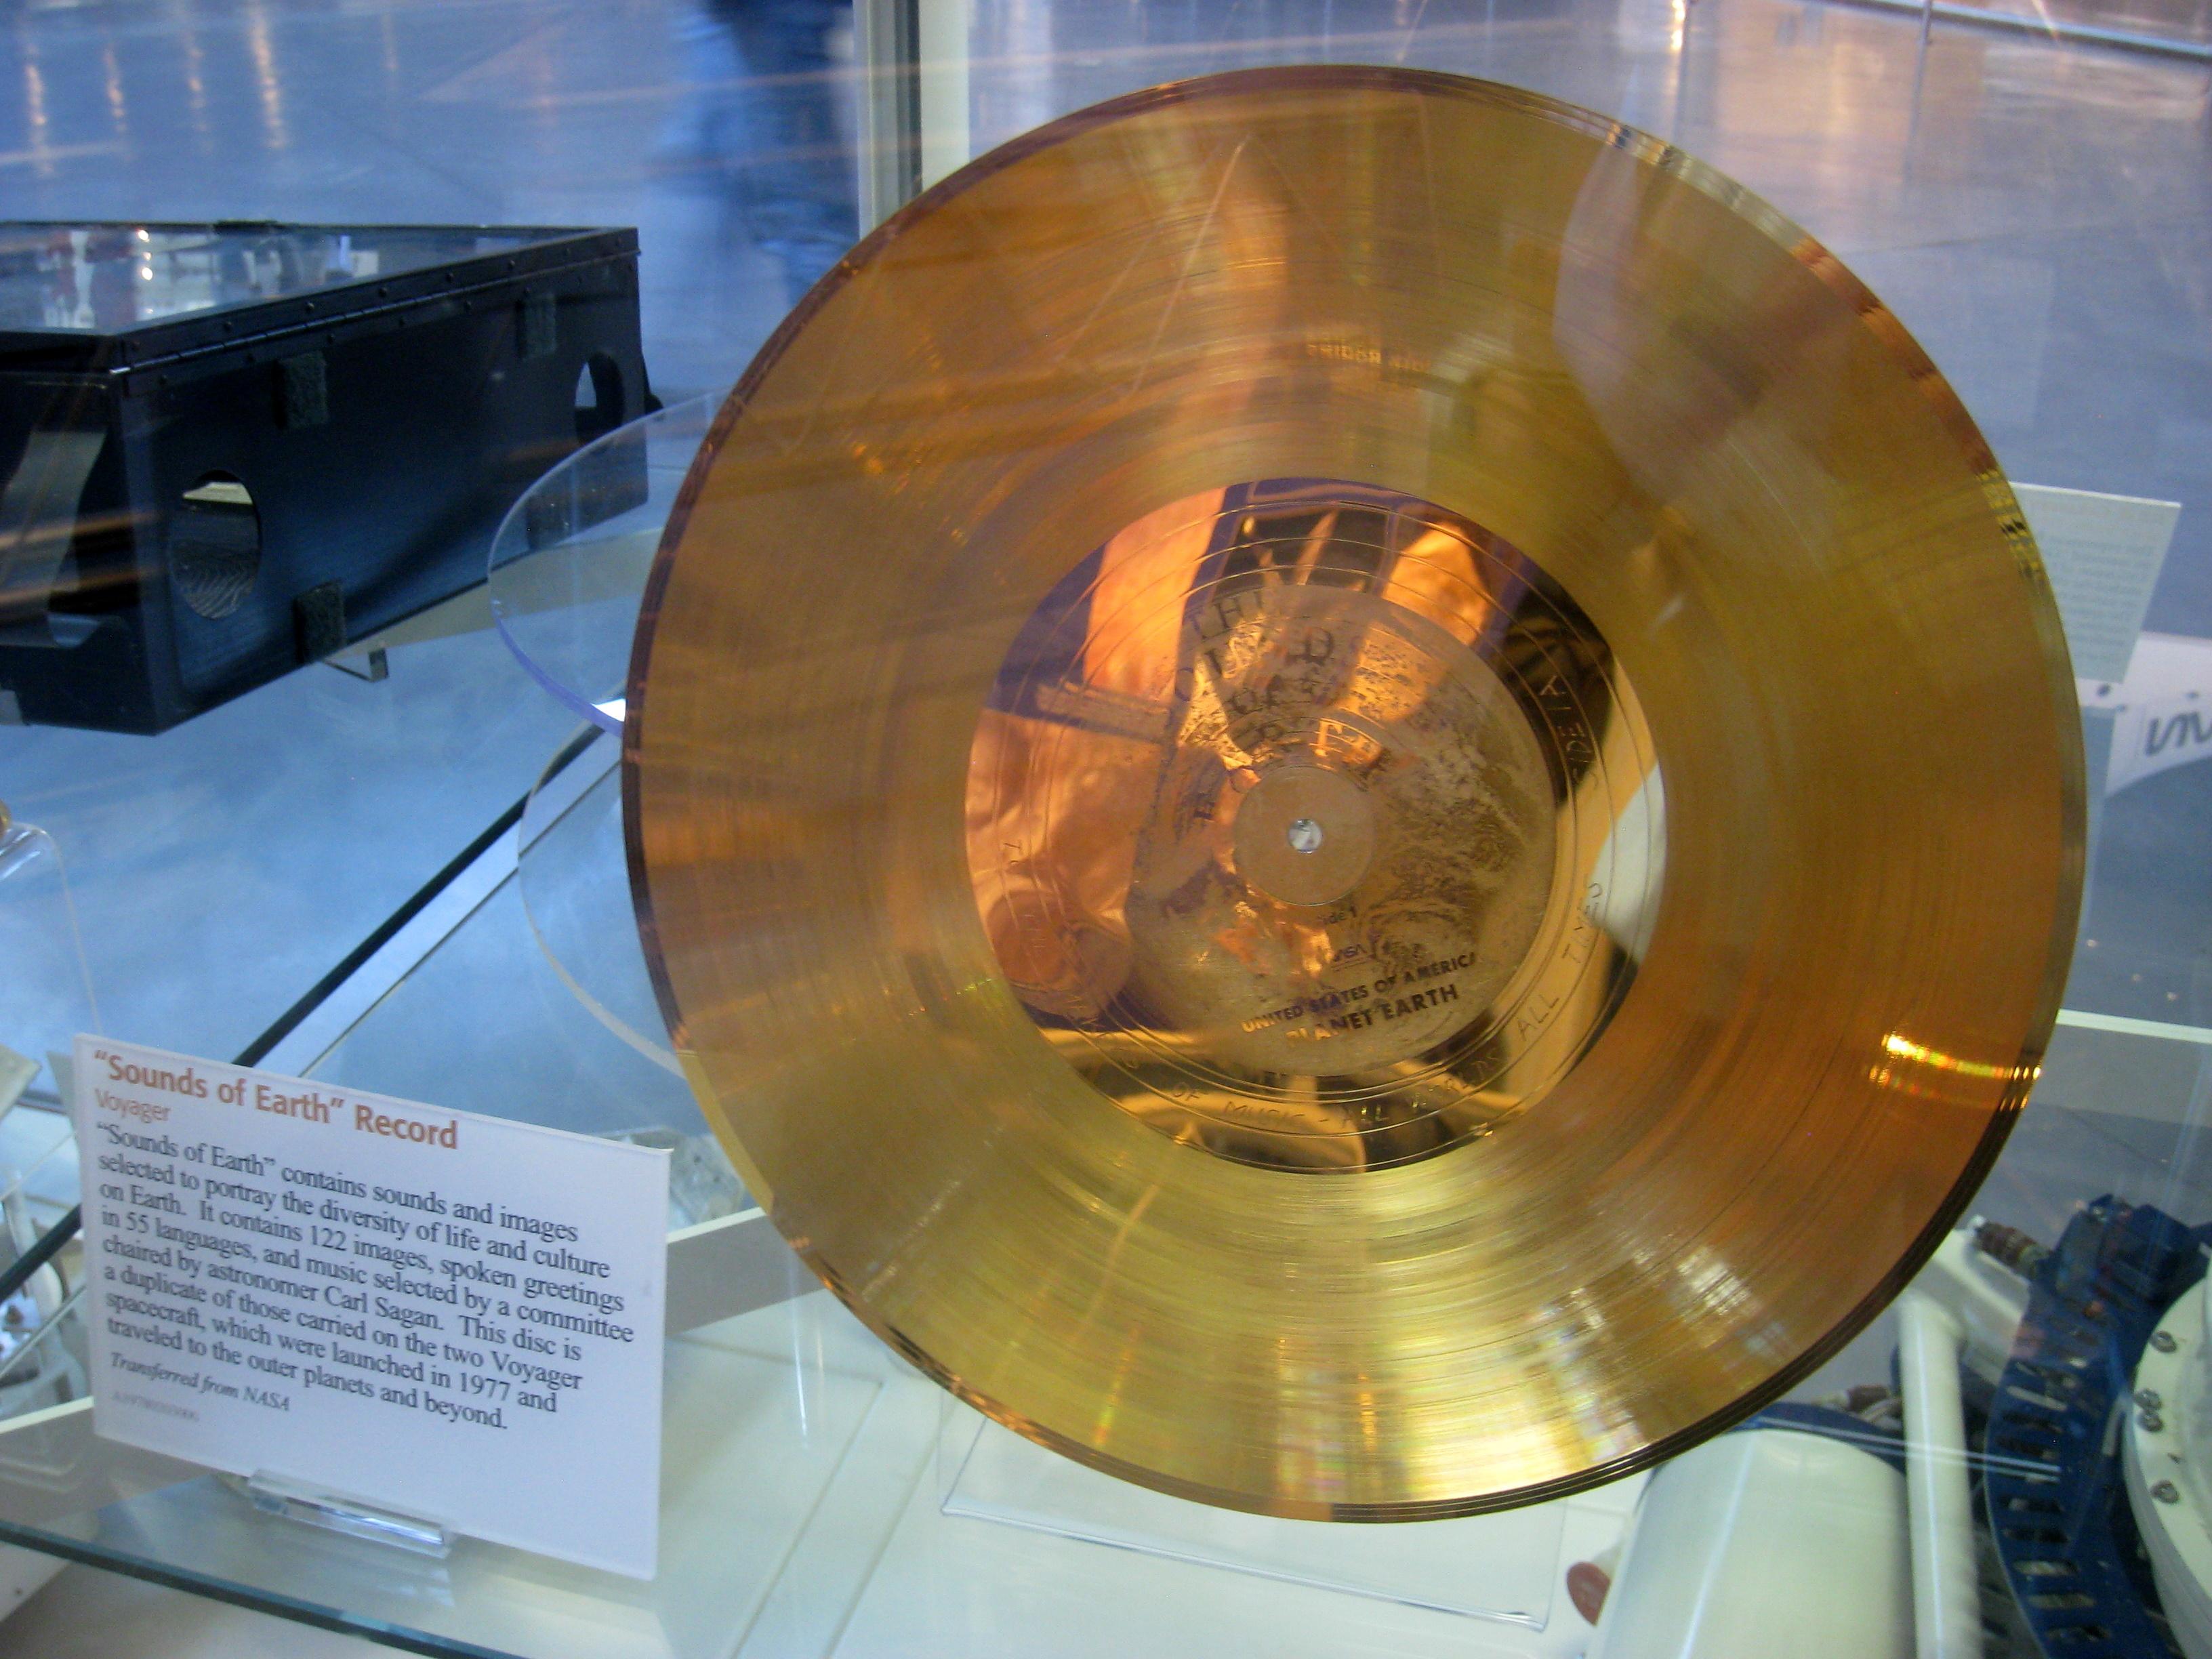 Joni Mitchell - Shine - lyrics